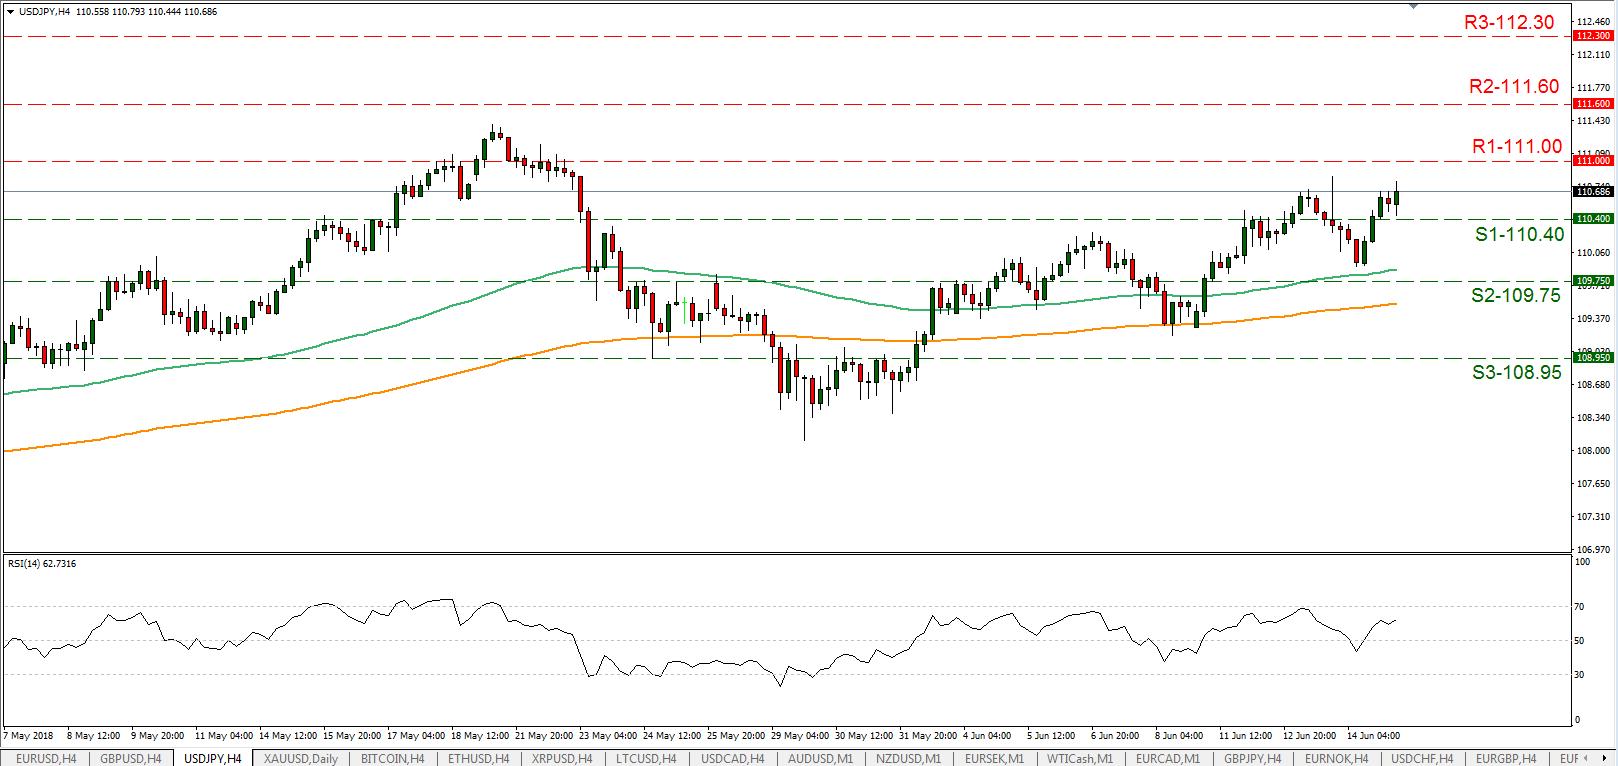 USD/JPY 15/06/2018 | EconAlerts